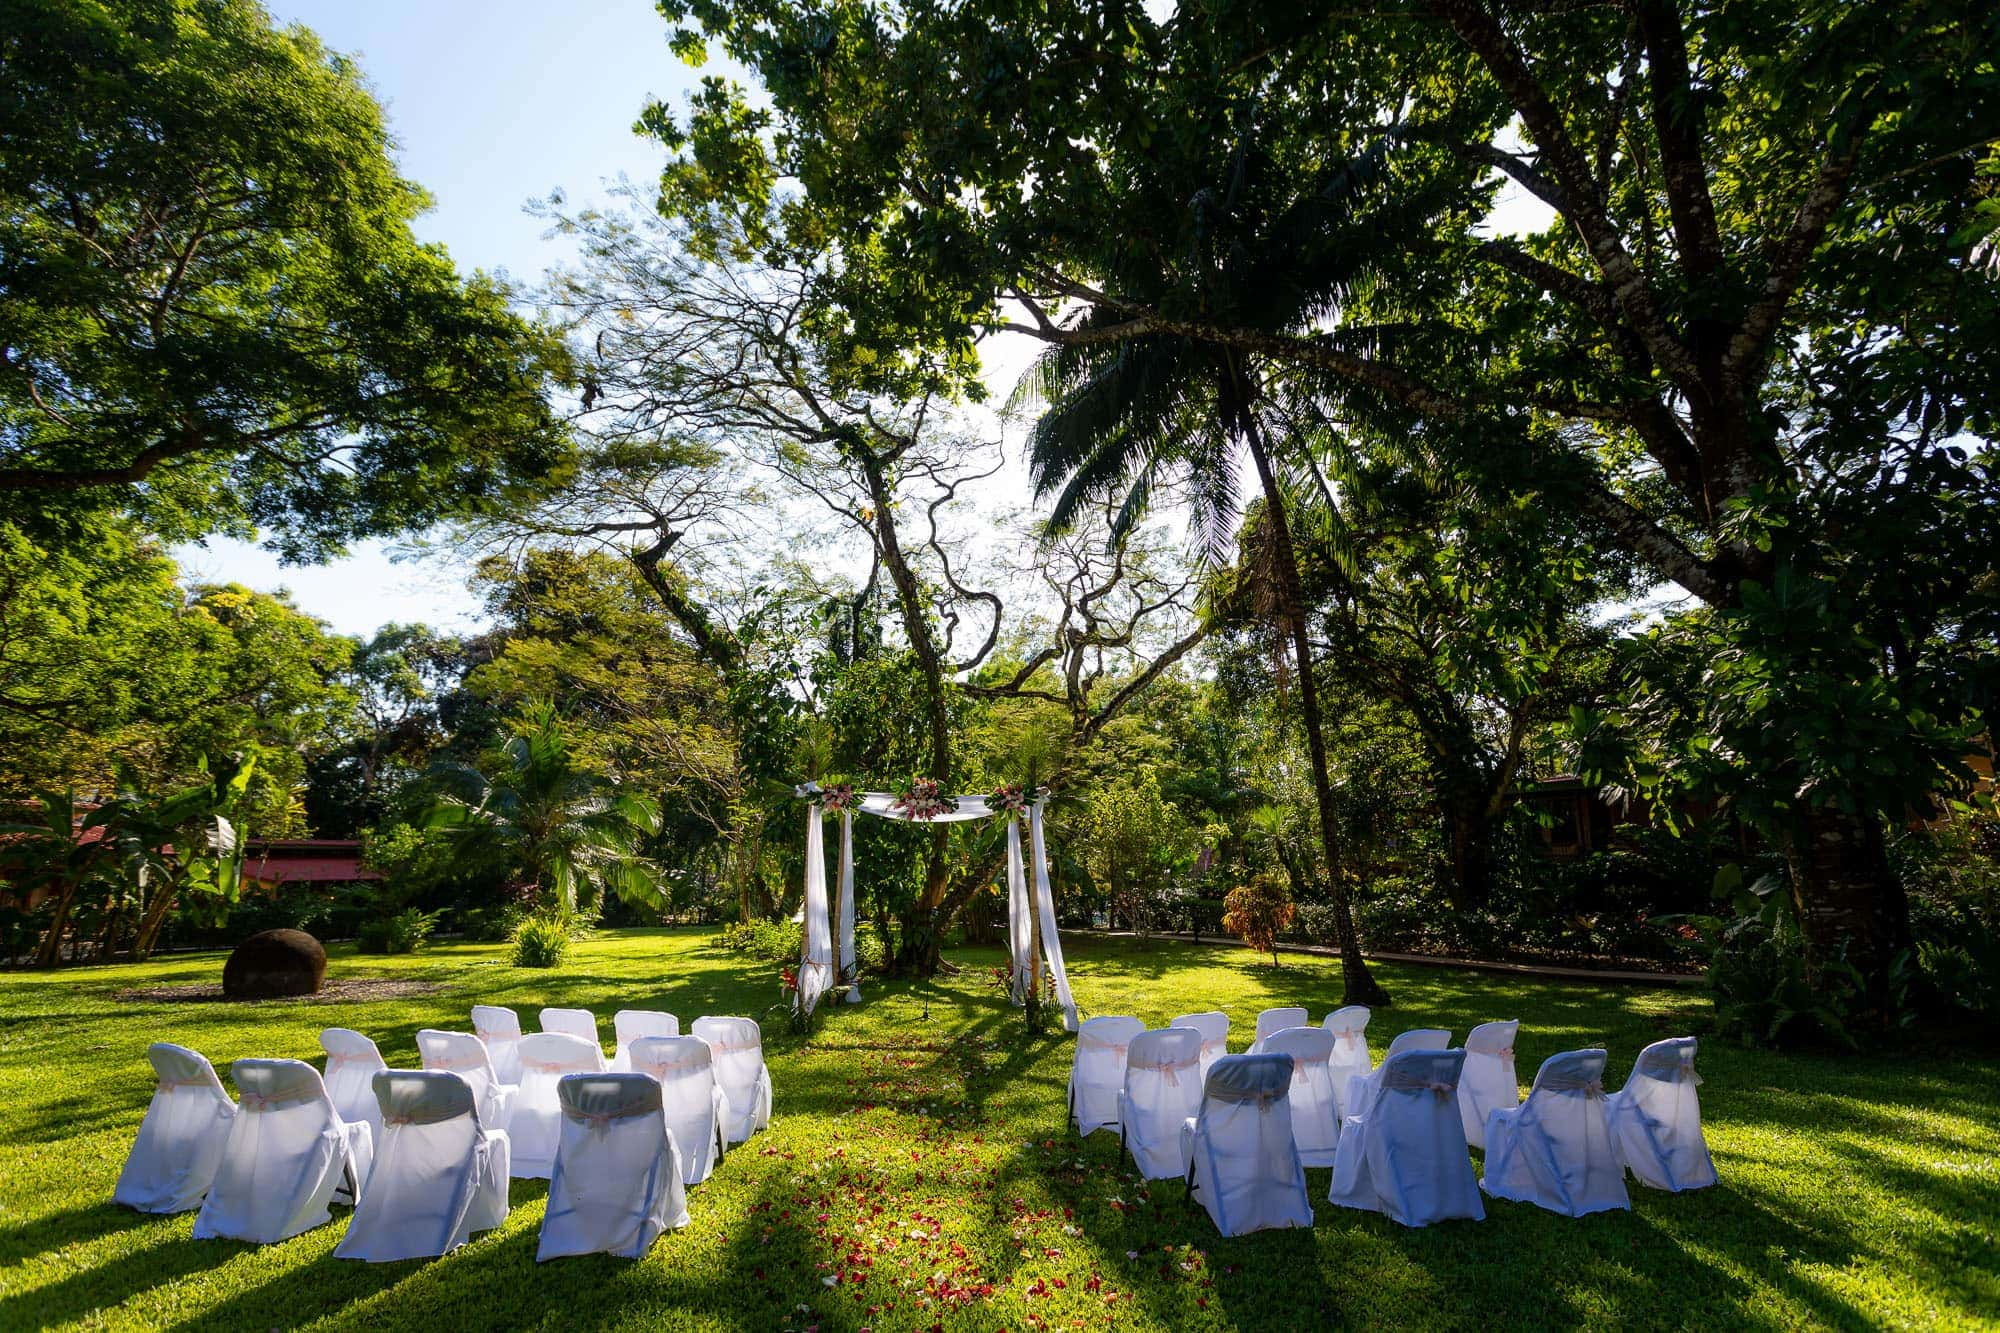 garden ceremony site at Doce Lunas in jaco, Costa Rica